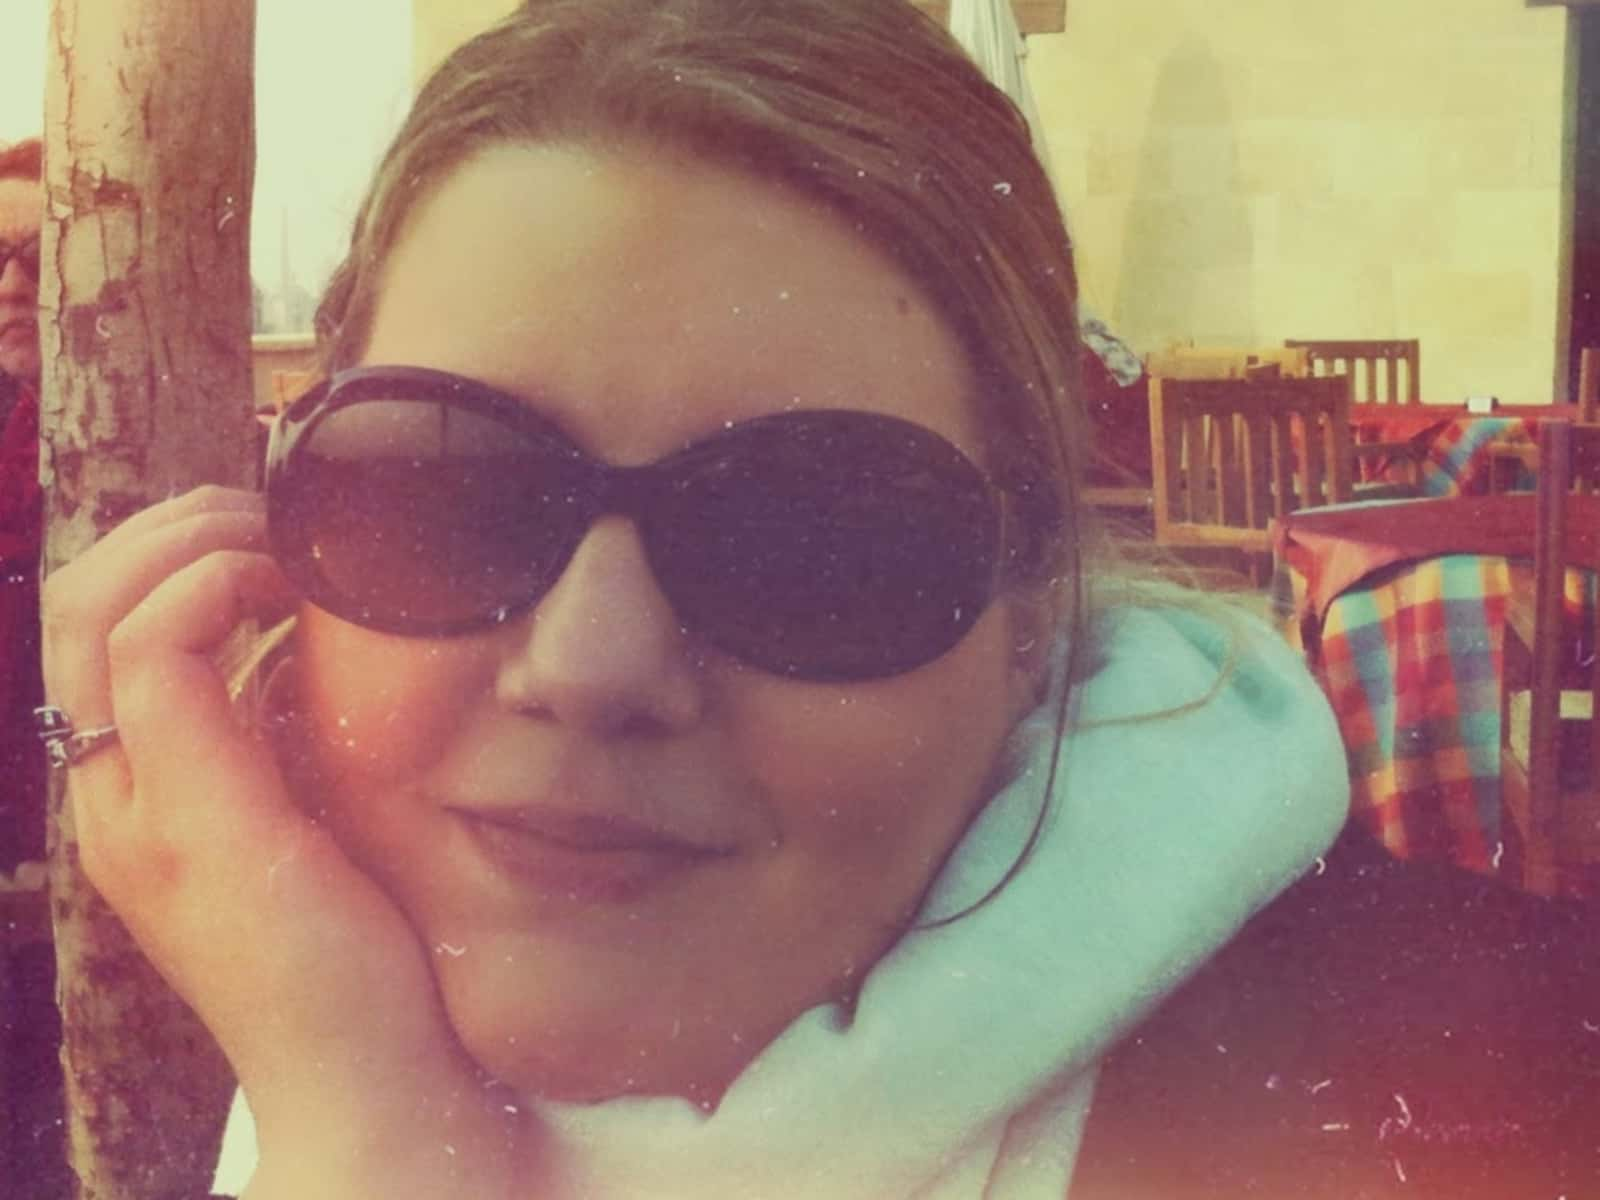 Jessica from New York City, New York, United States